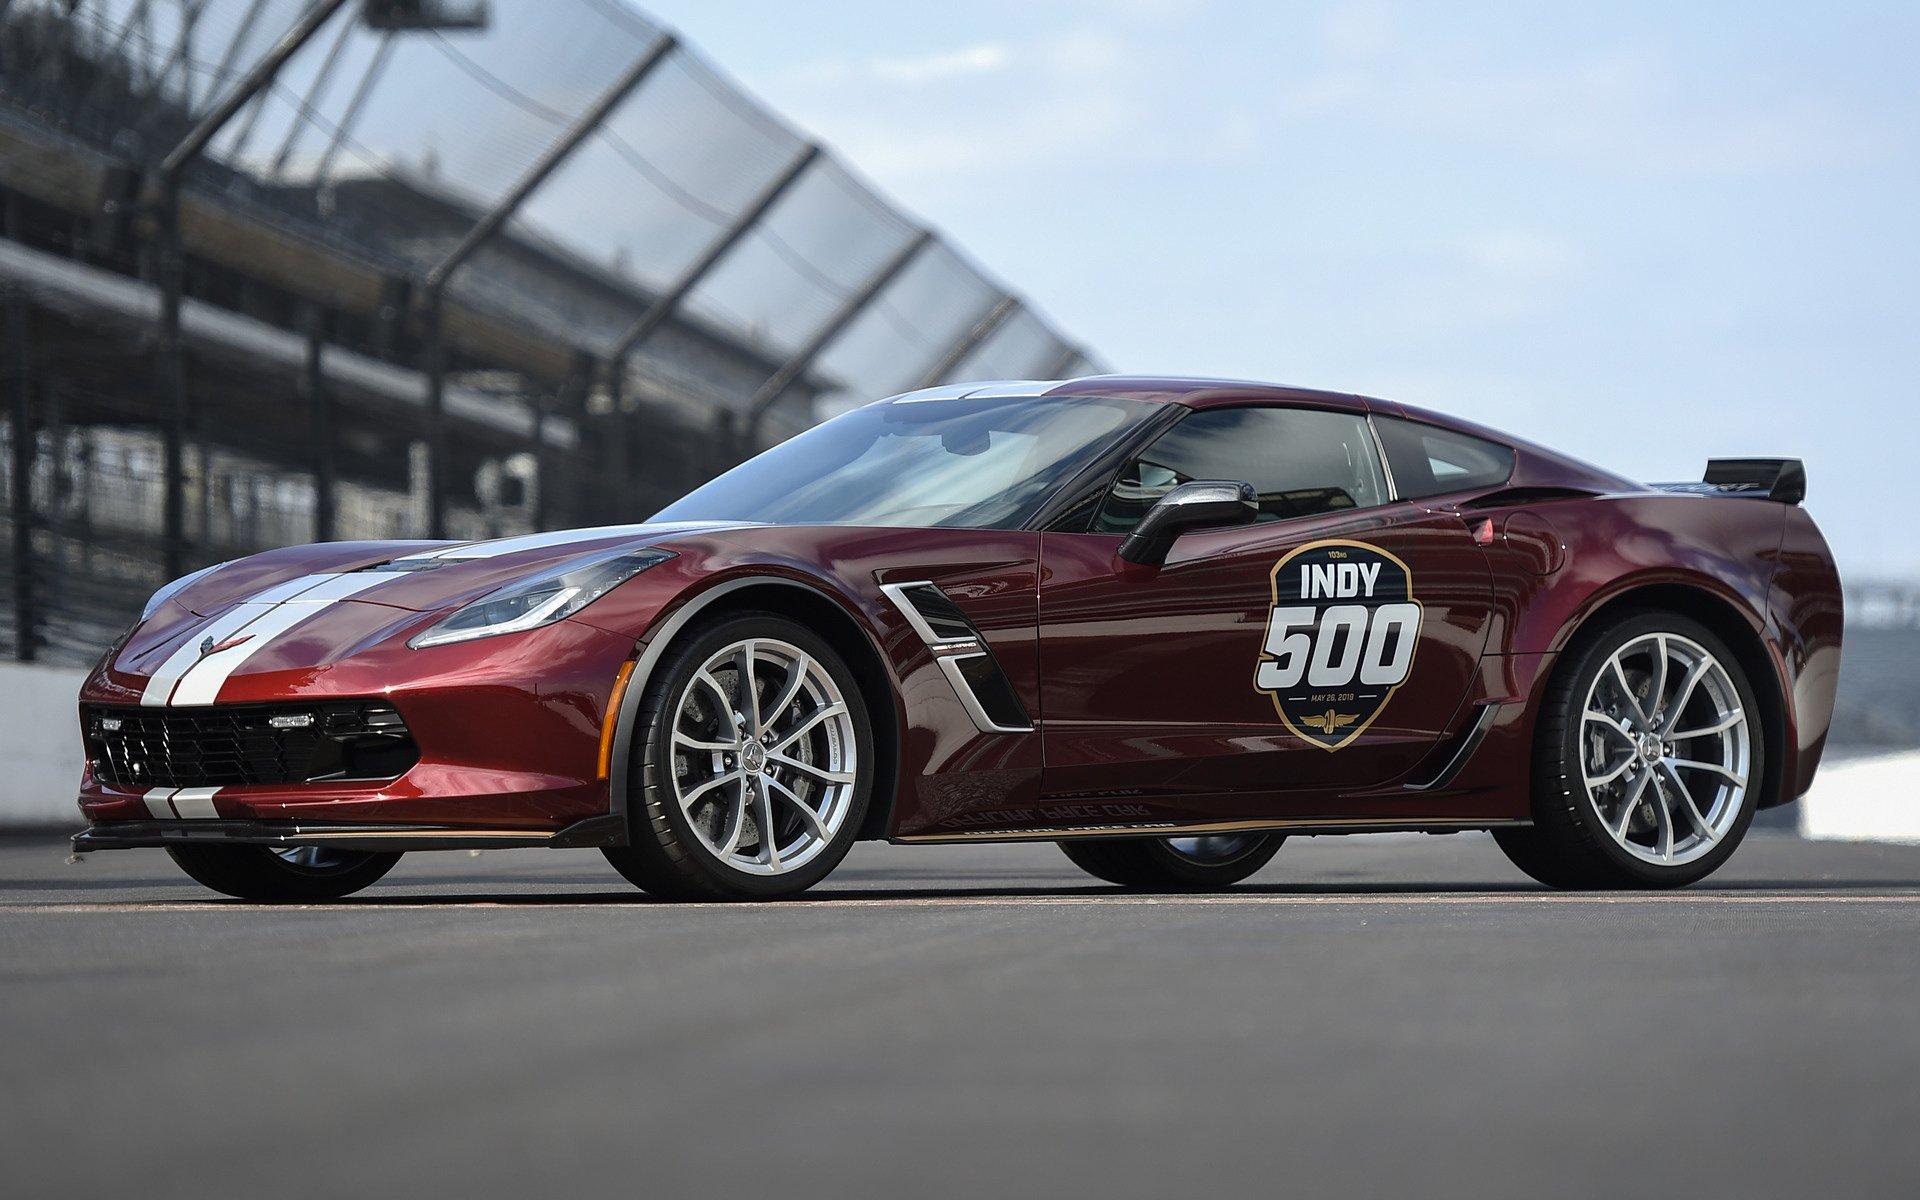 2019 Chevrolet Corvette Grand Sport Indy 500 Pace Car   Wallpapers 1920x1200